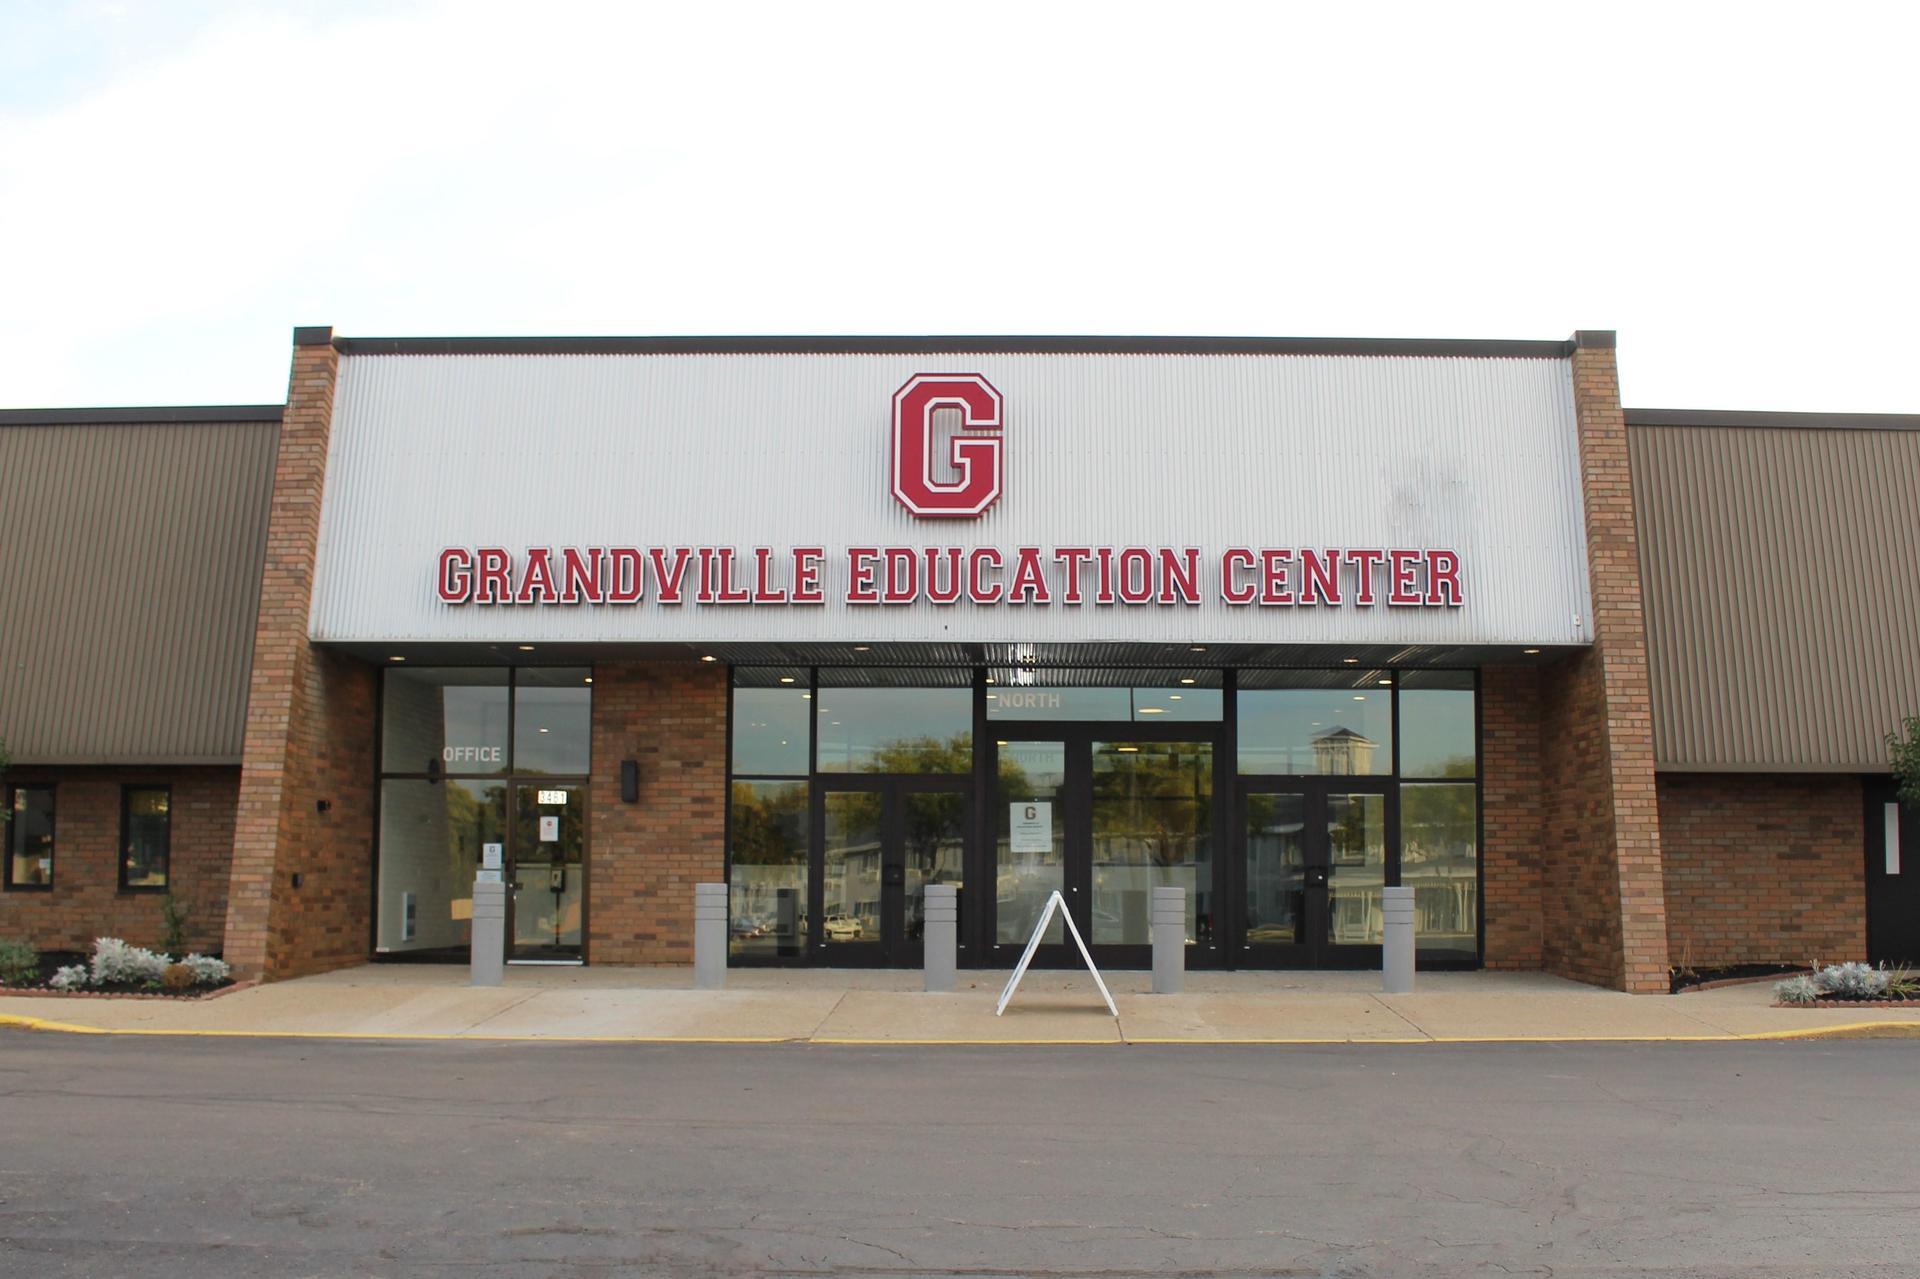 exterior of GEC building entrance